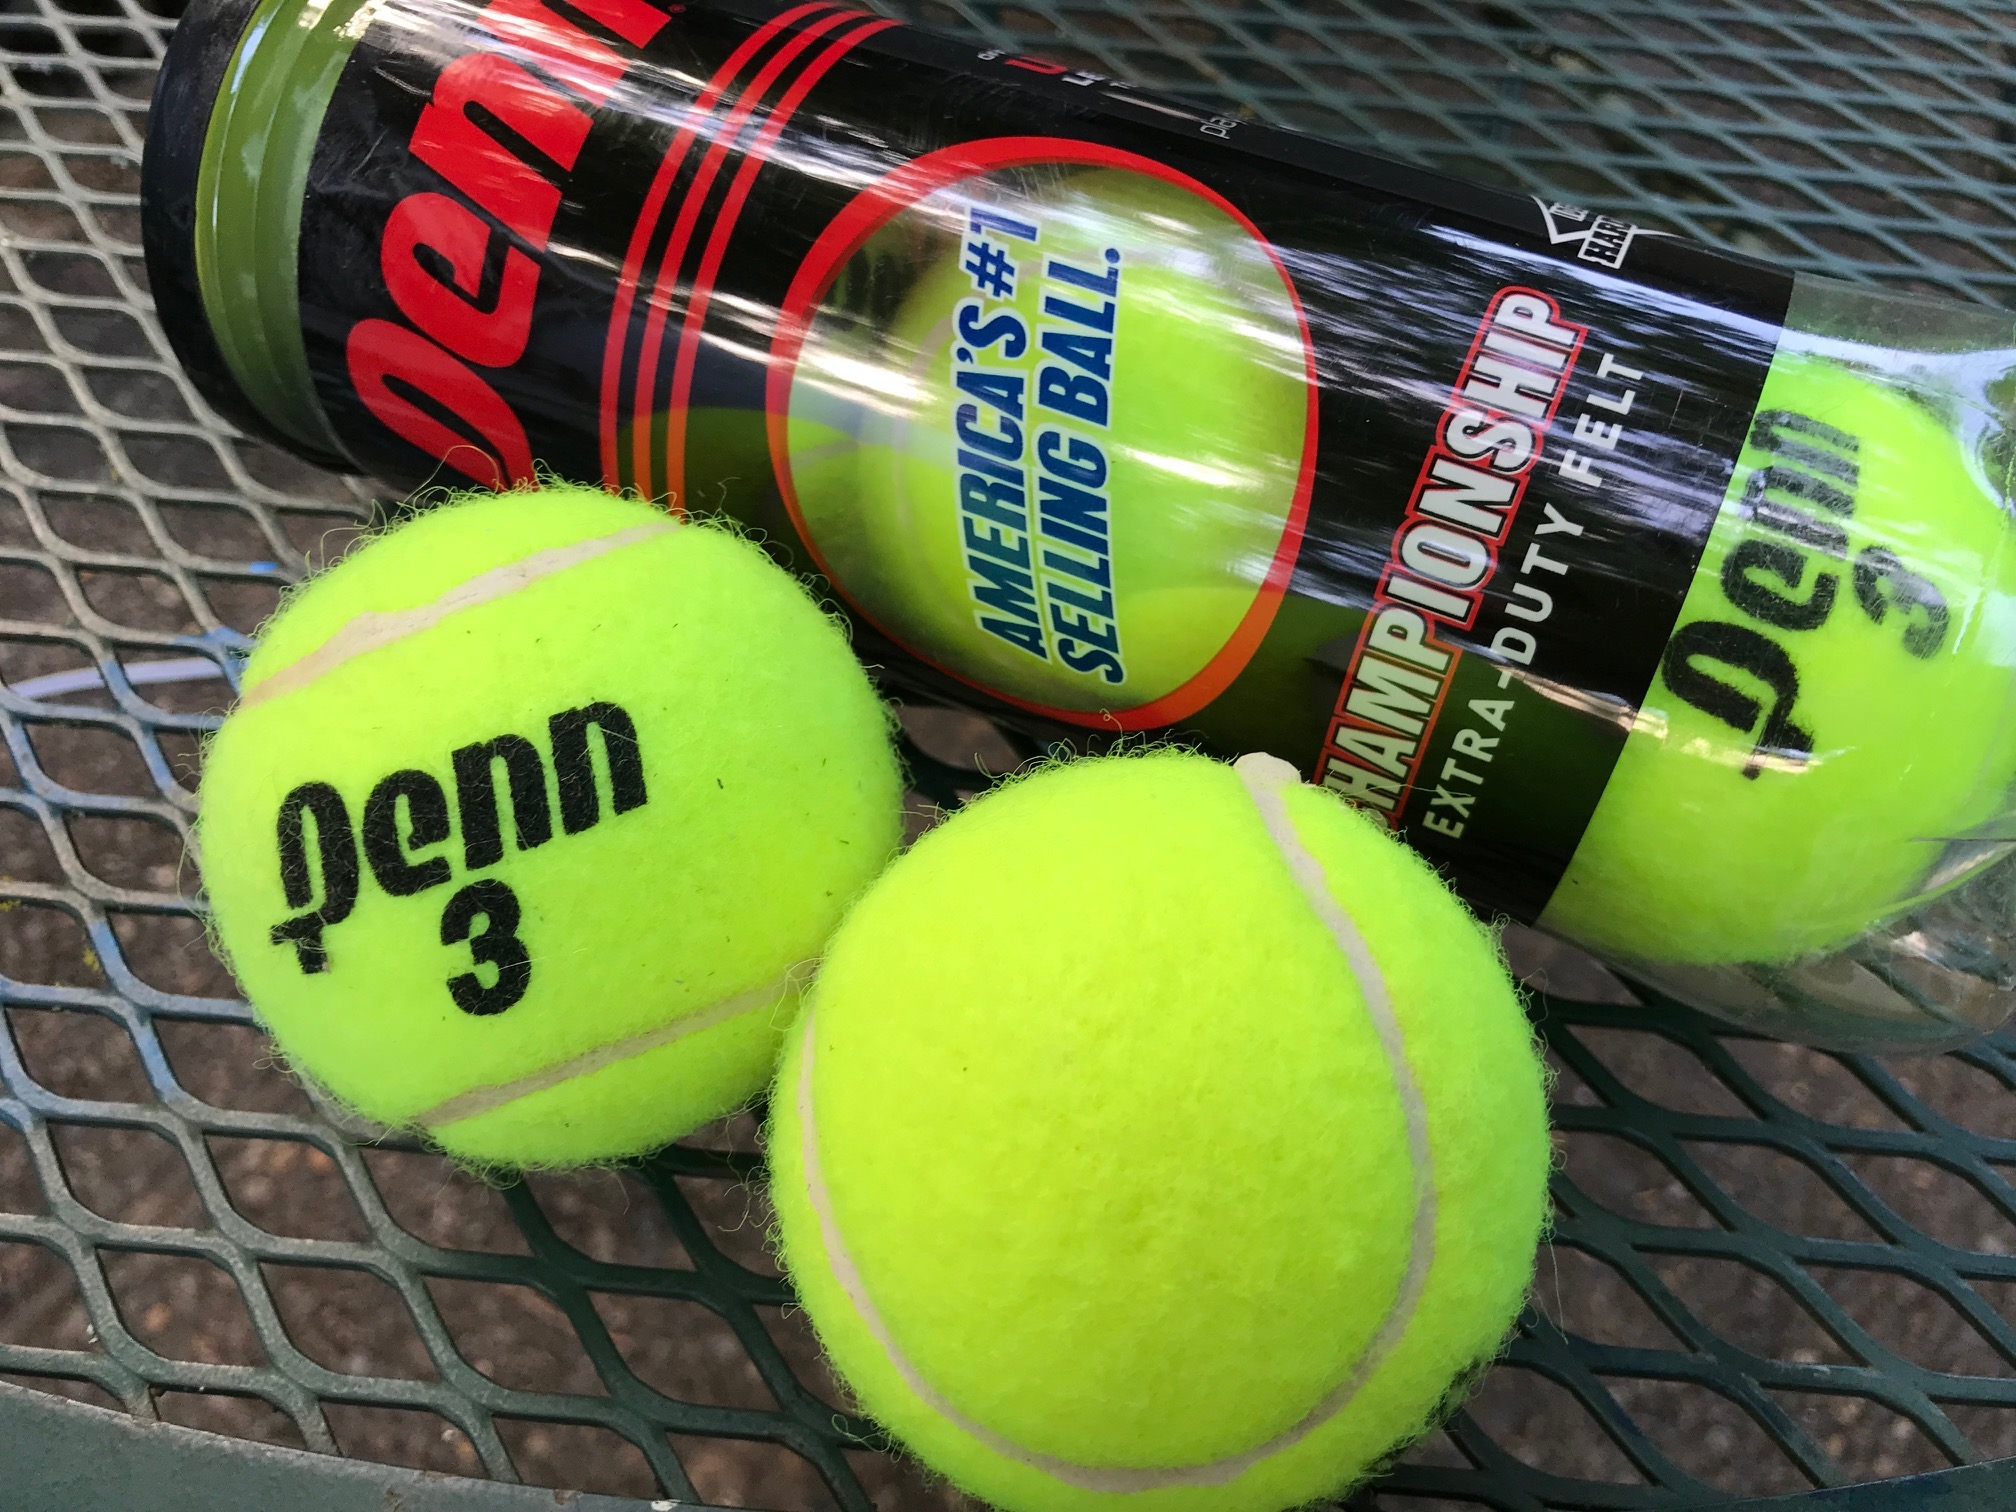 Penn Championship Extra-Duty Felt Tennis Balls